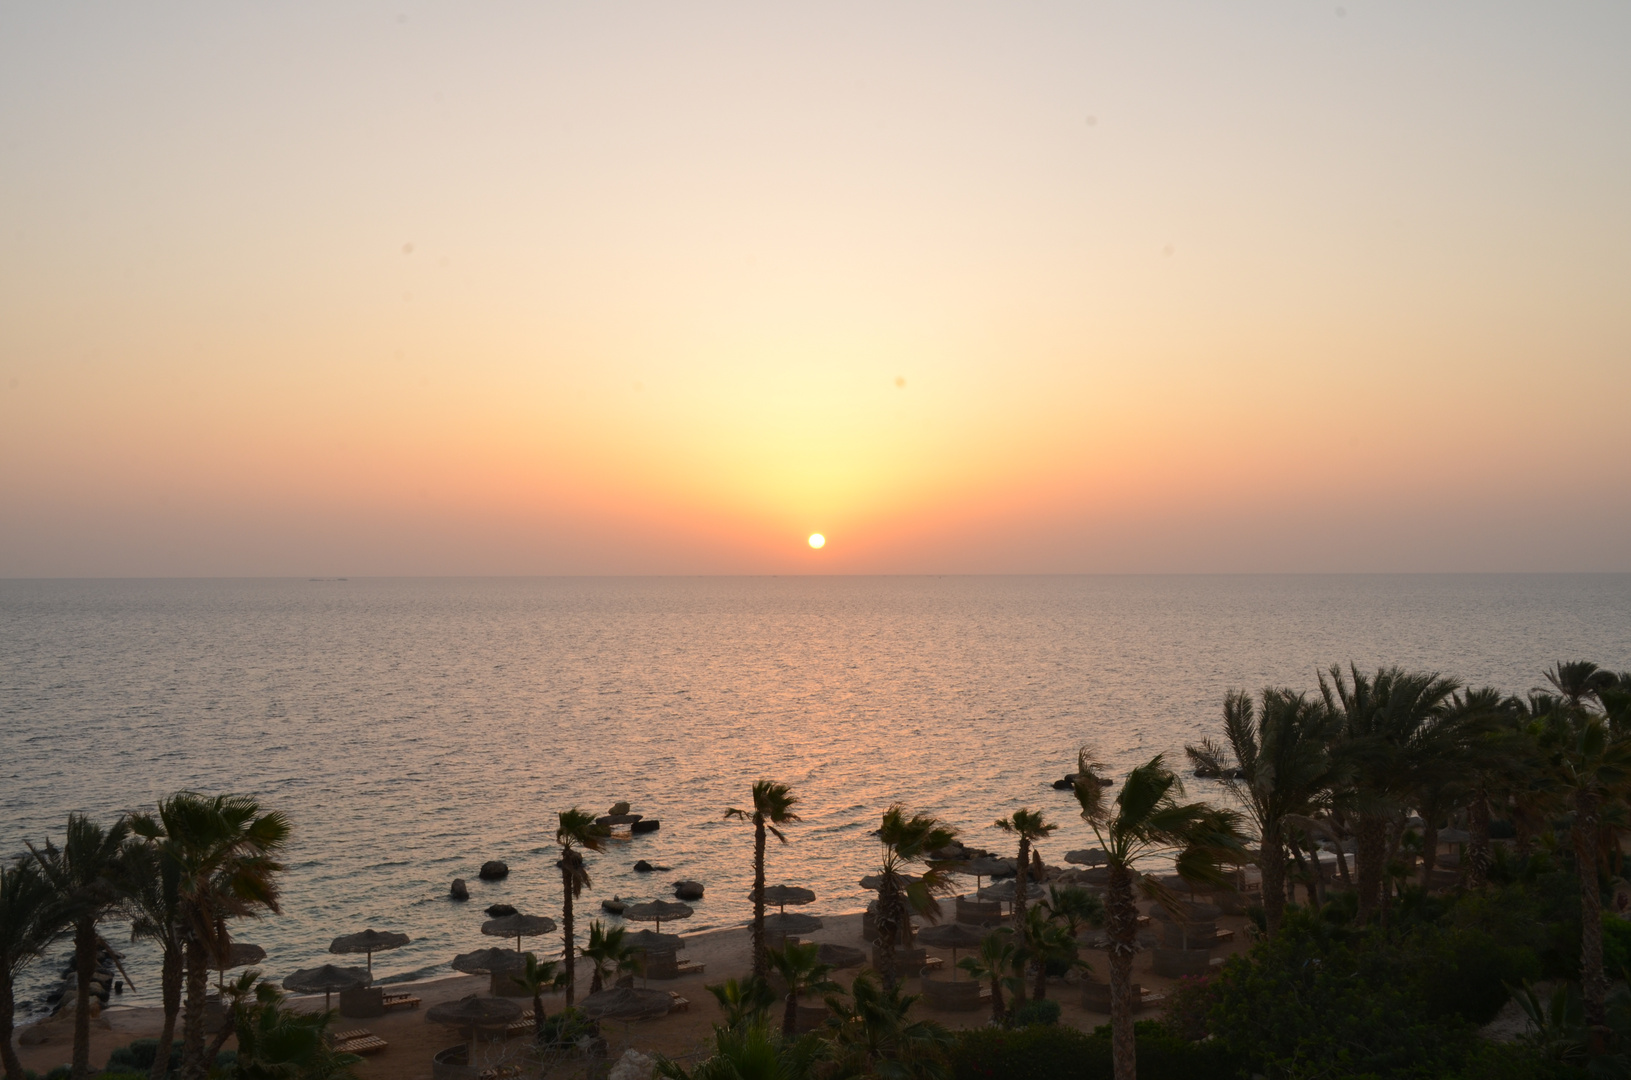 Sonnenaufgang in Hurghada